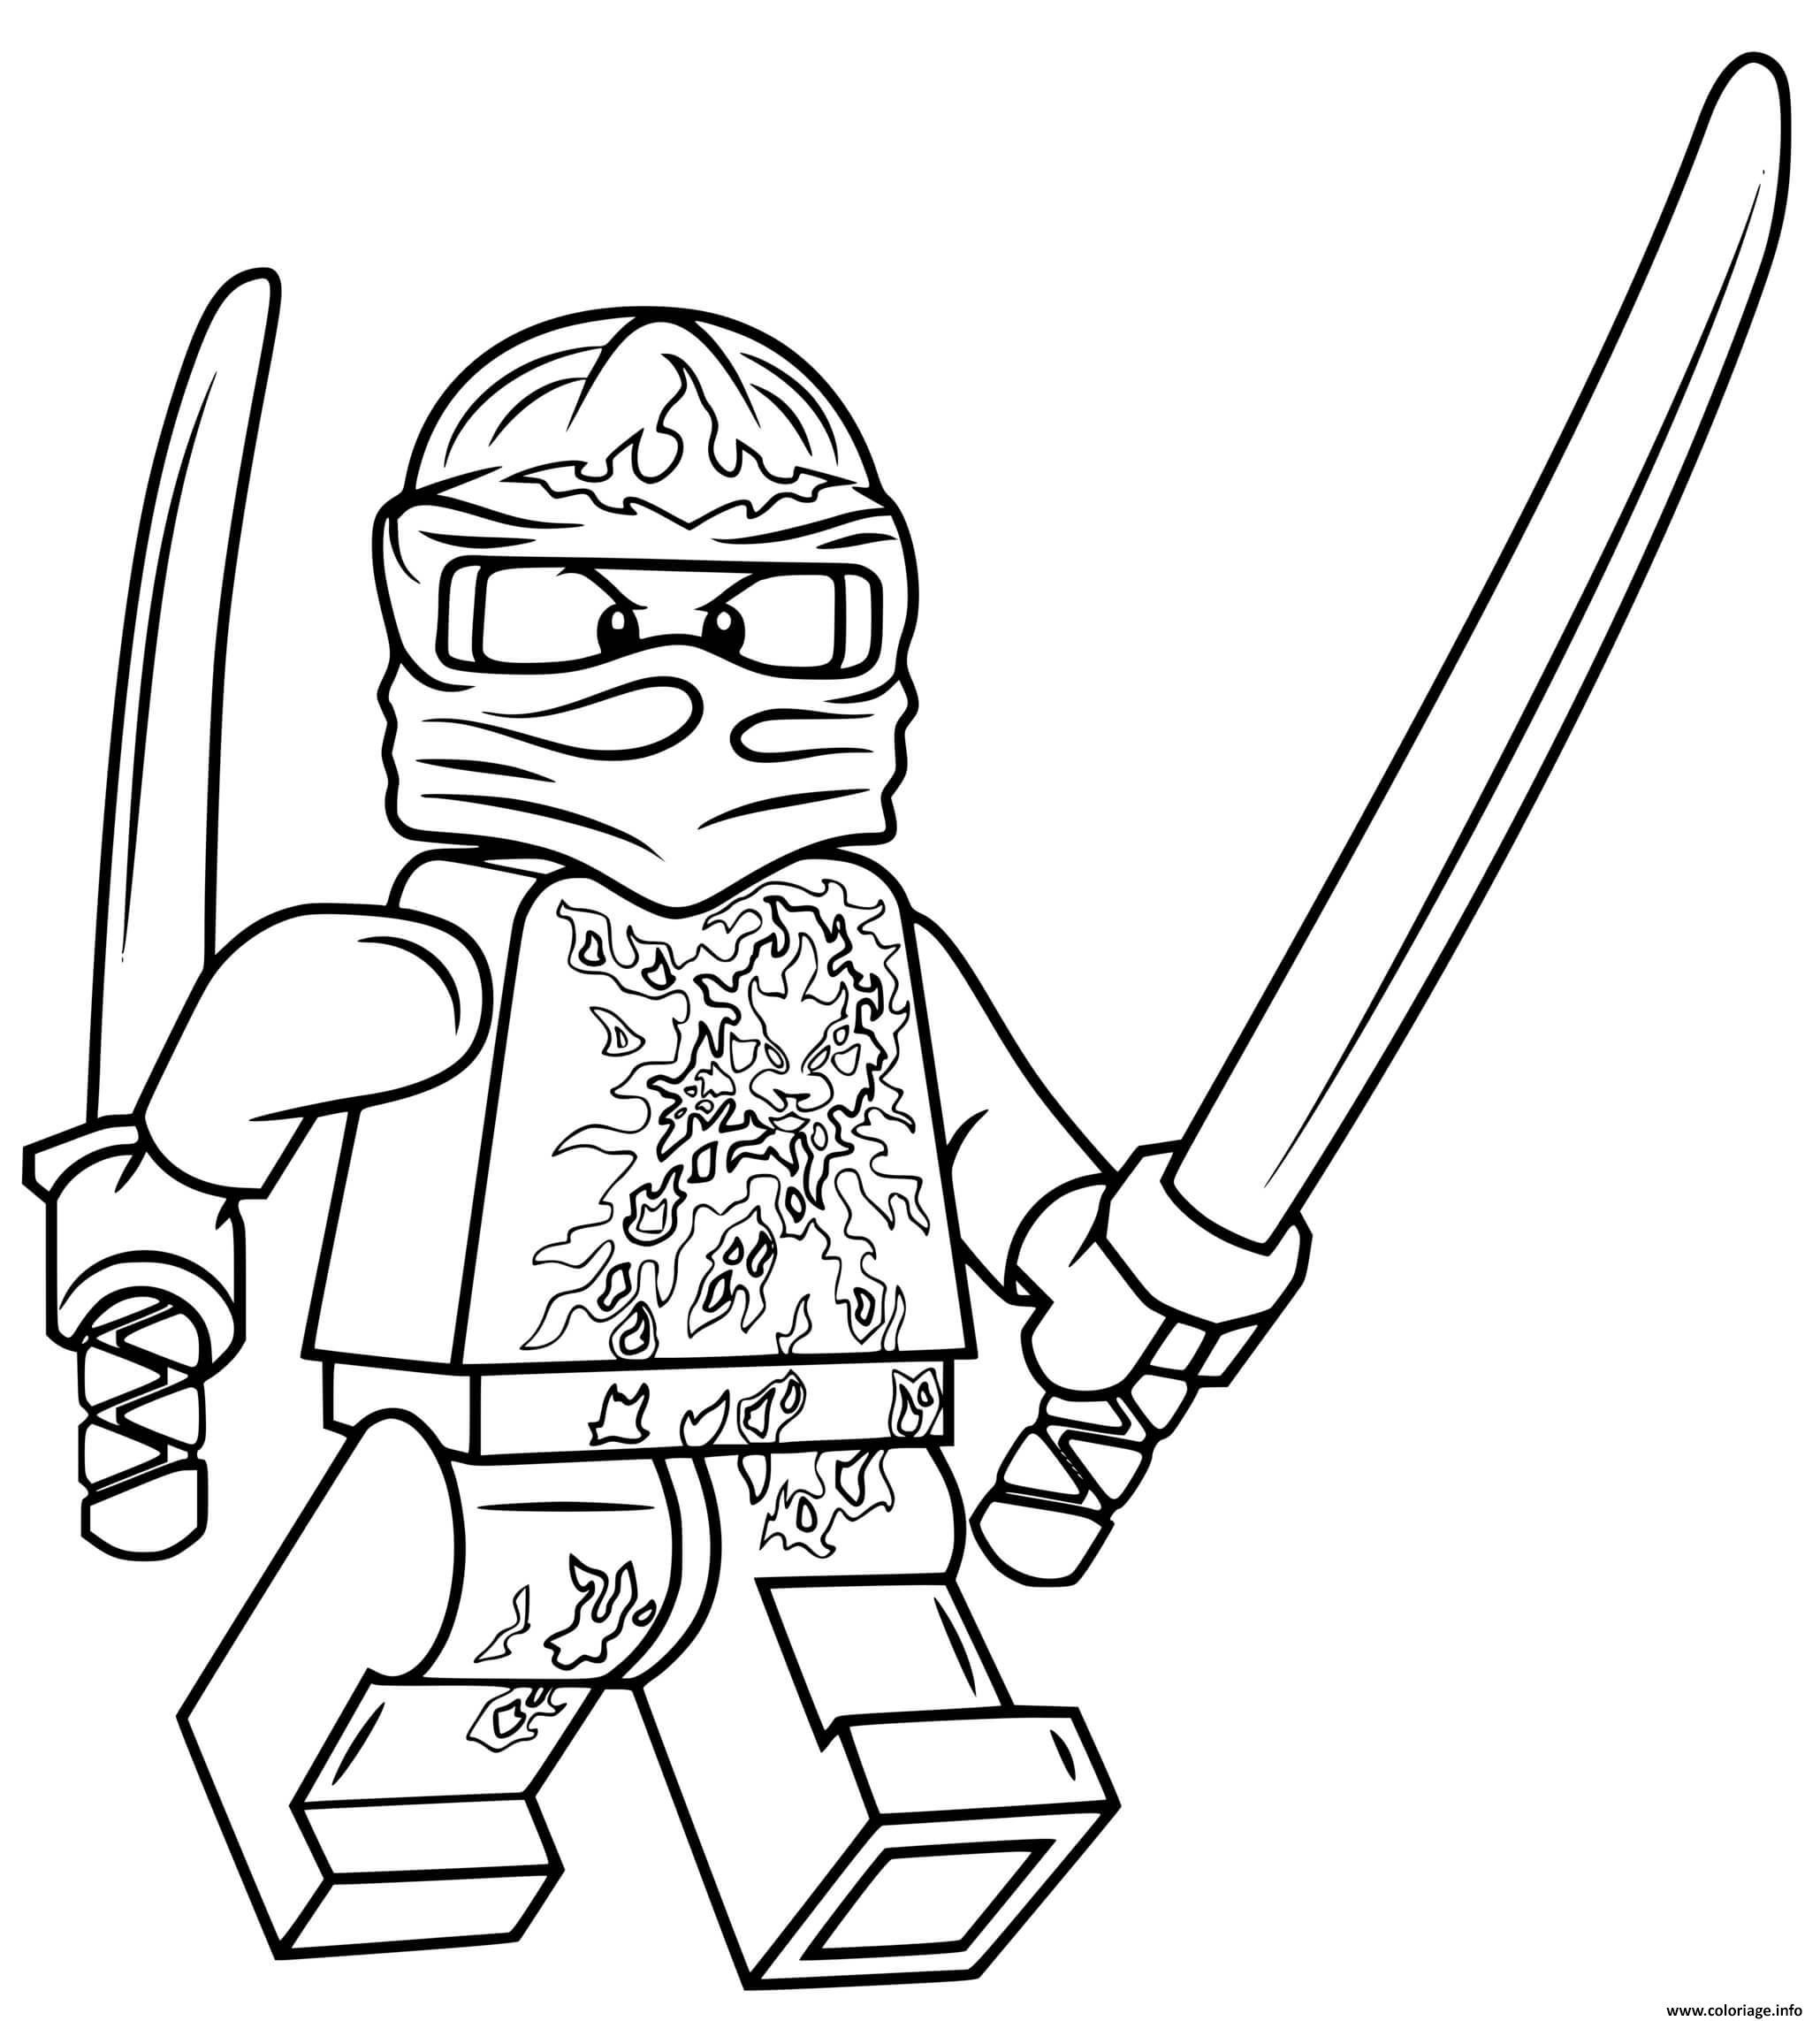 Dessin lego ninjago kai nrg Coloriage Gratuit à Imprimer